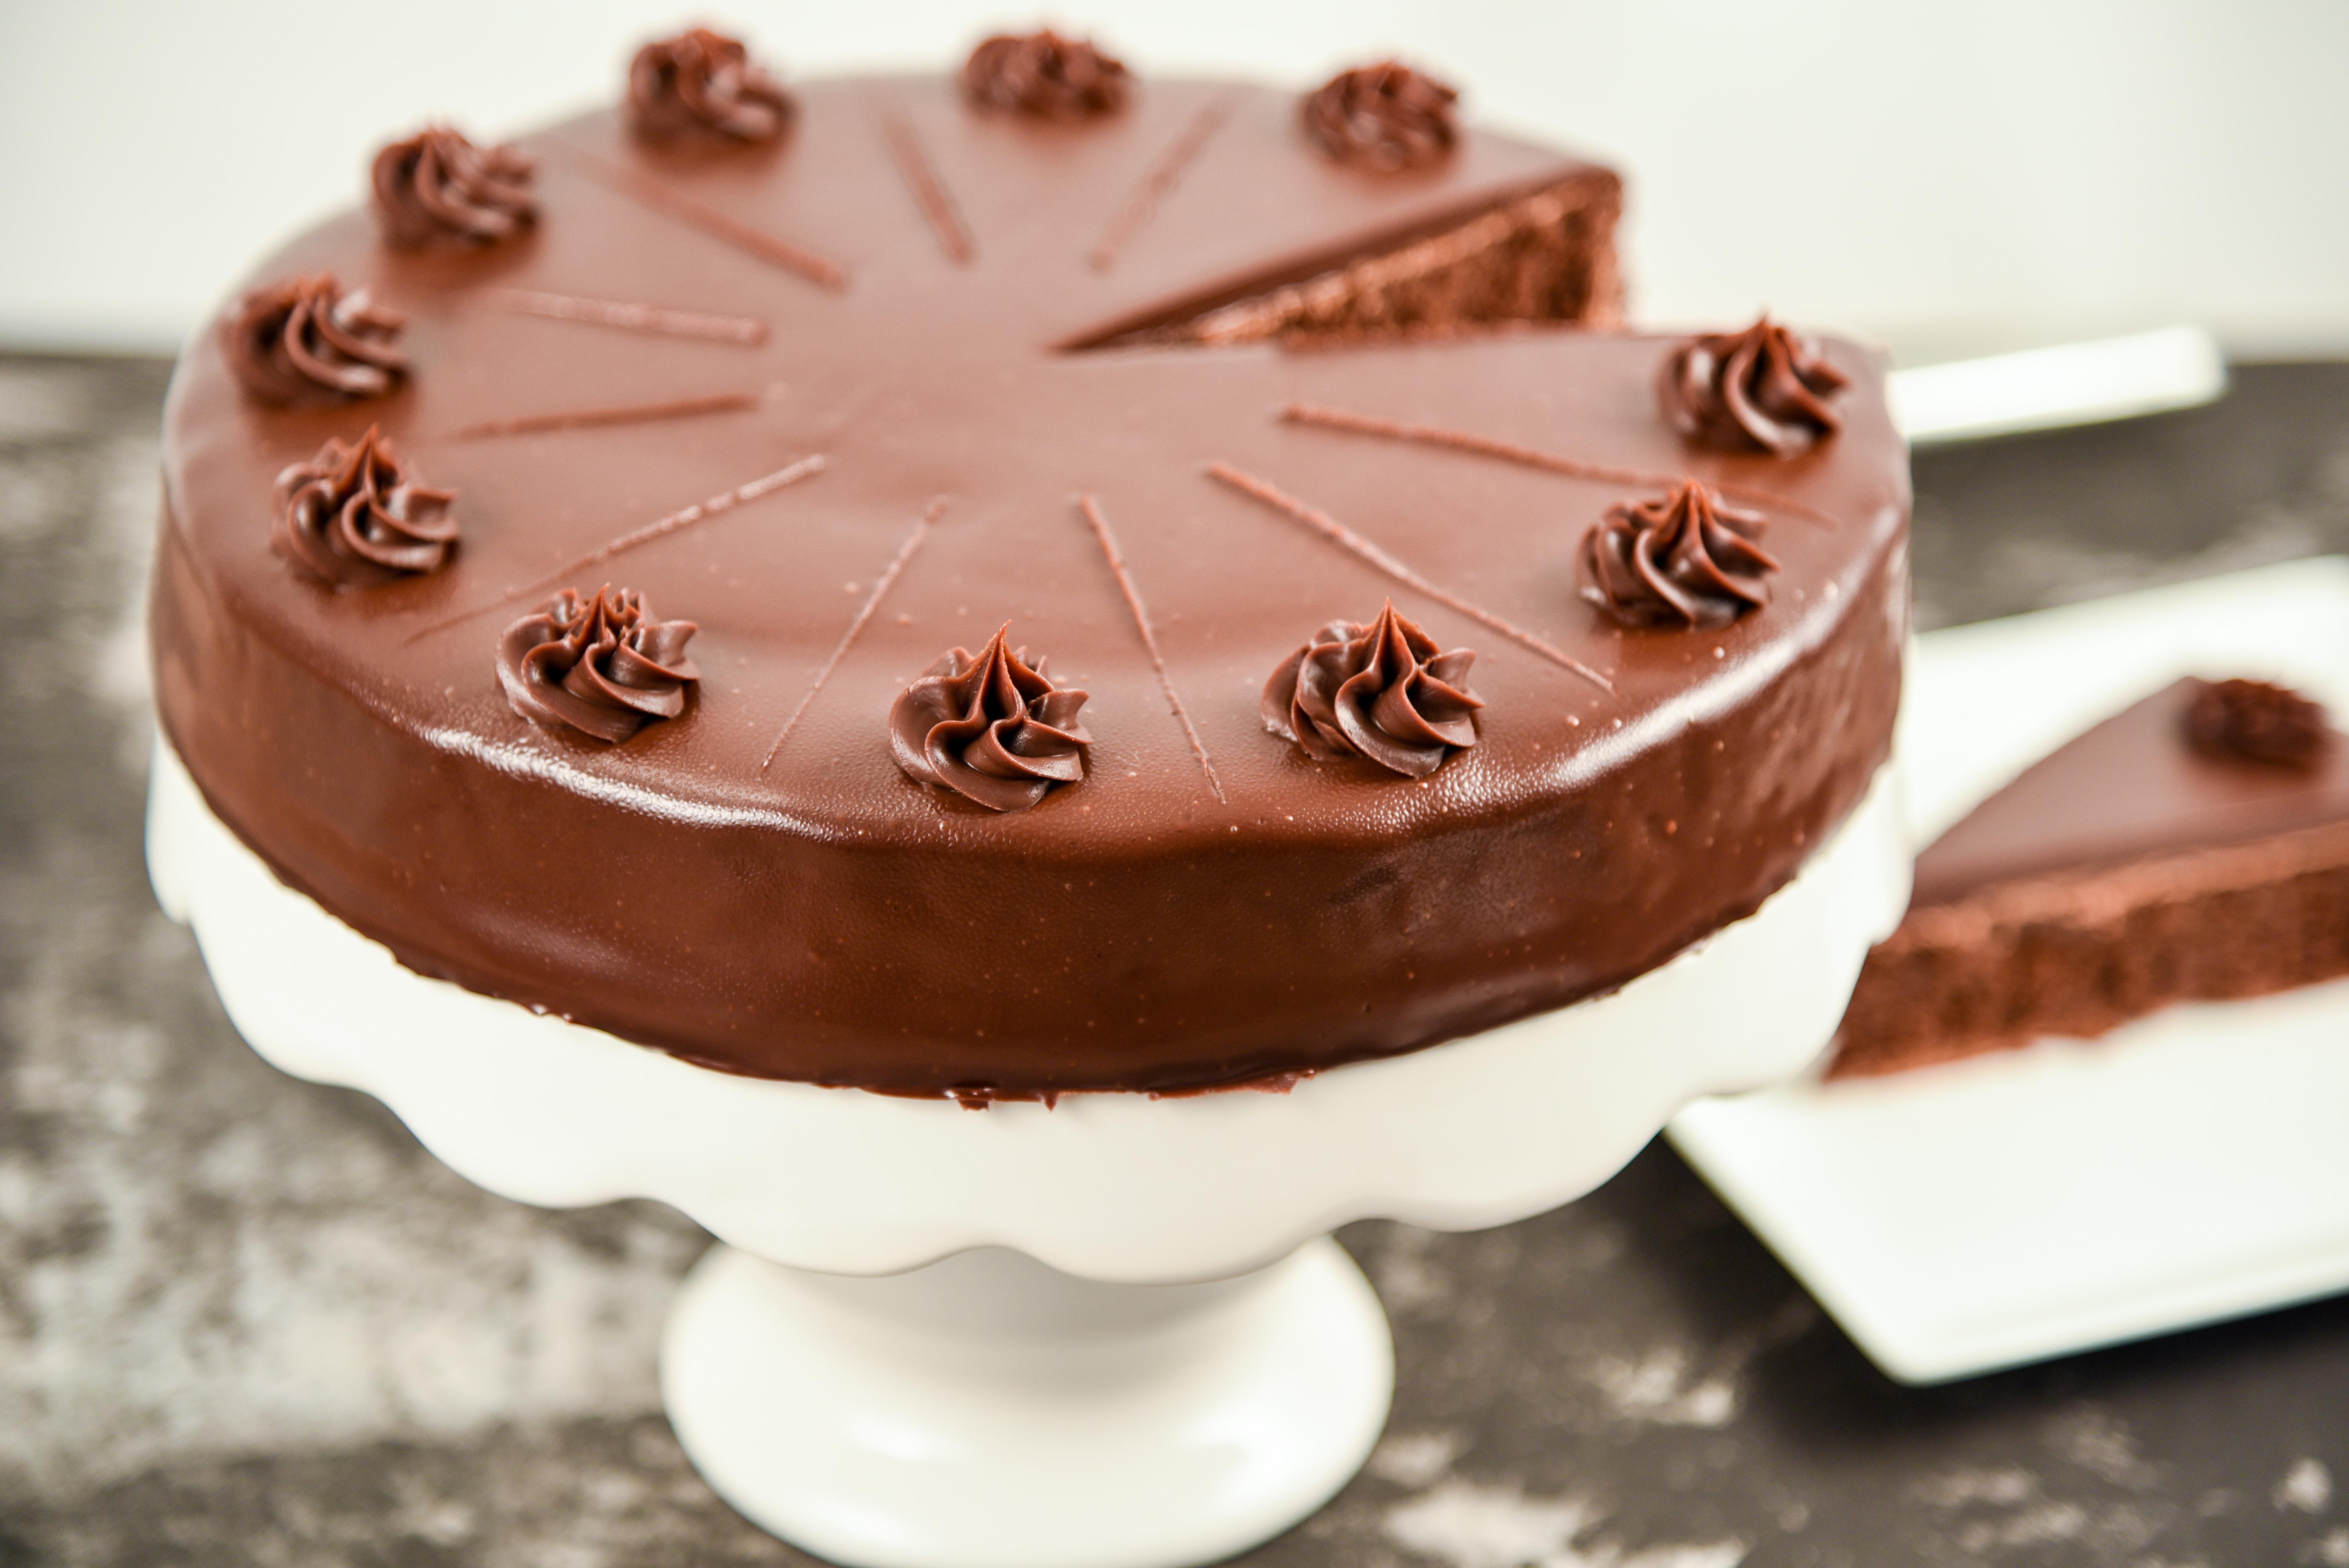 Yom Kippur Dessert Chocolate Cake